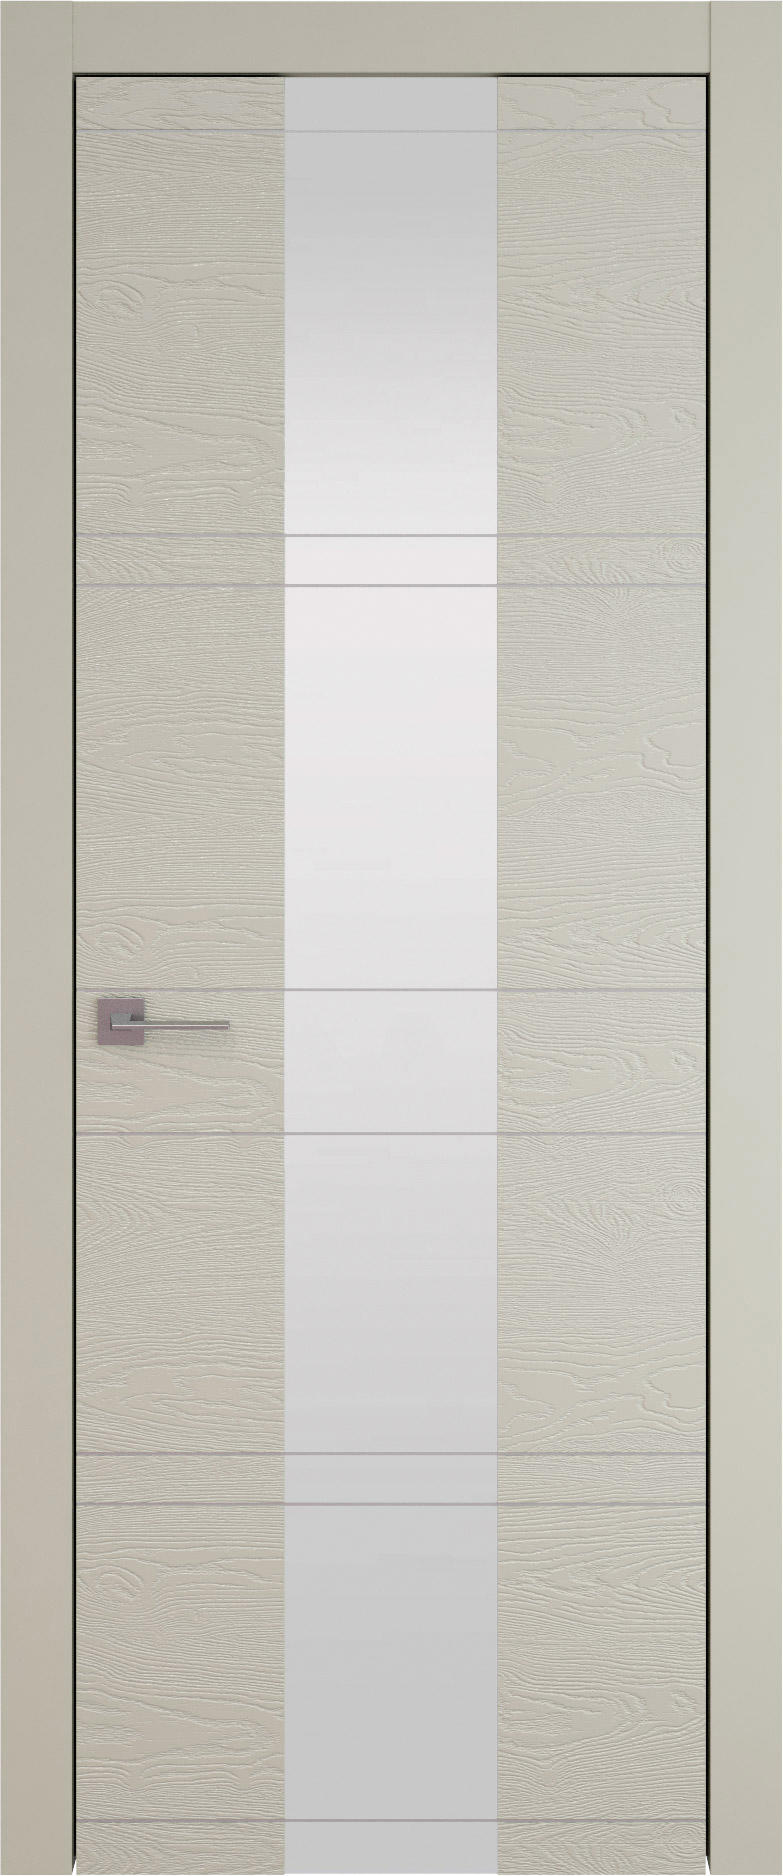 Tivoli Ж-2 цвет - Серо-оливковая эмаль по шпону (RAL 7032) Со стеклом (ДО)